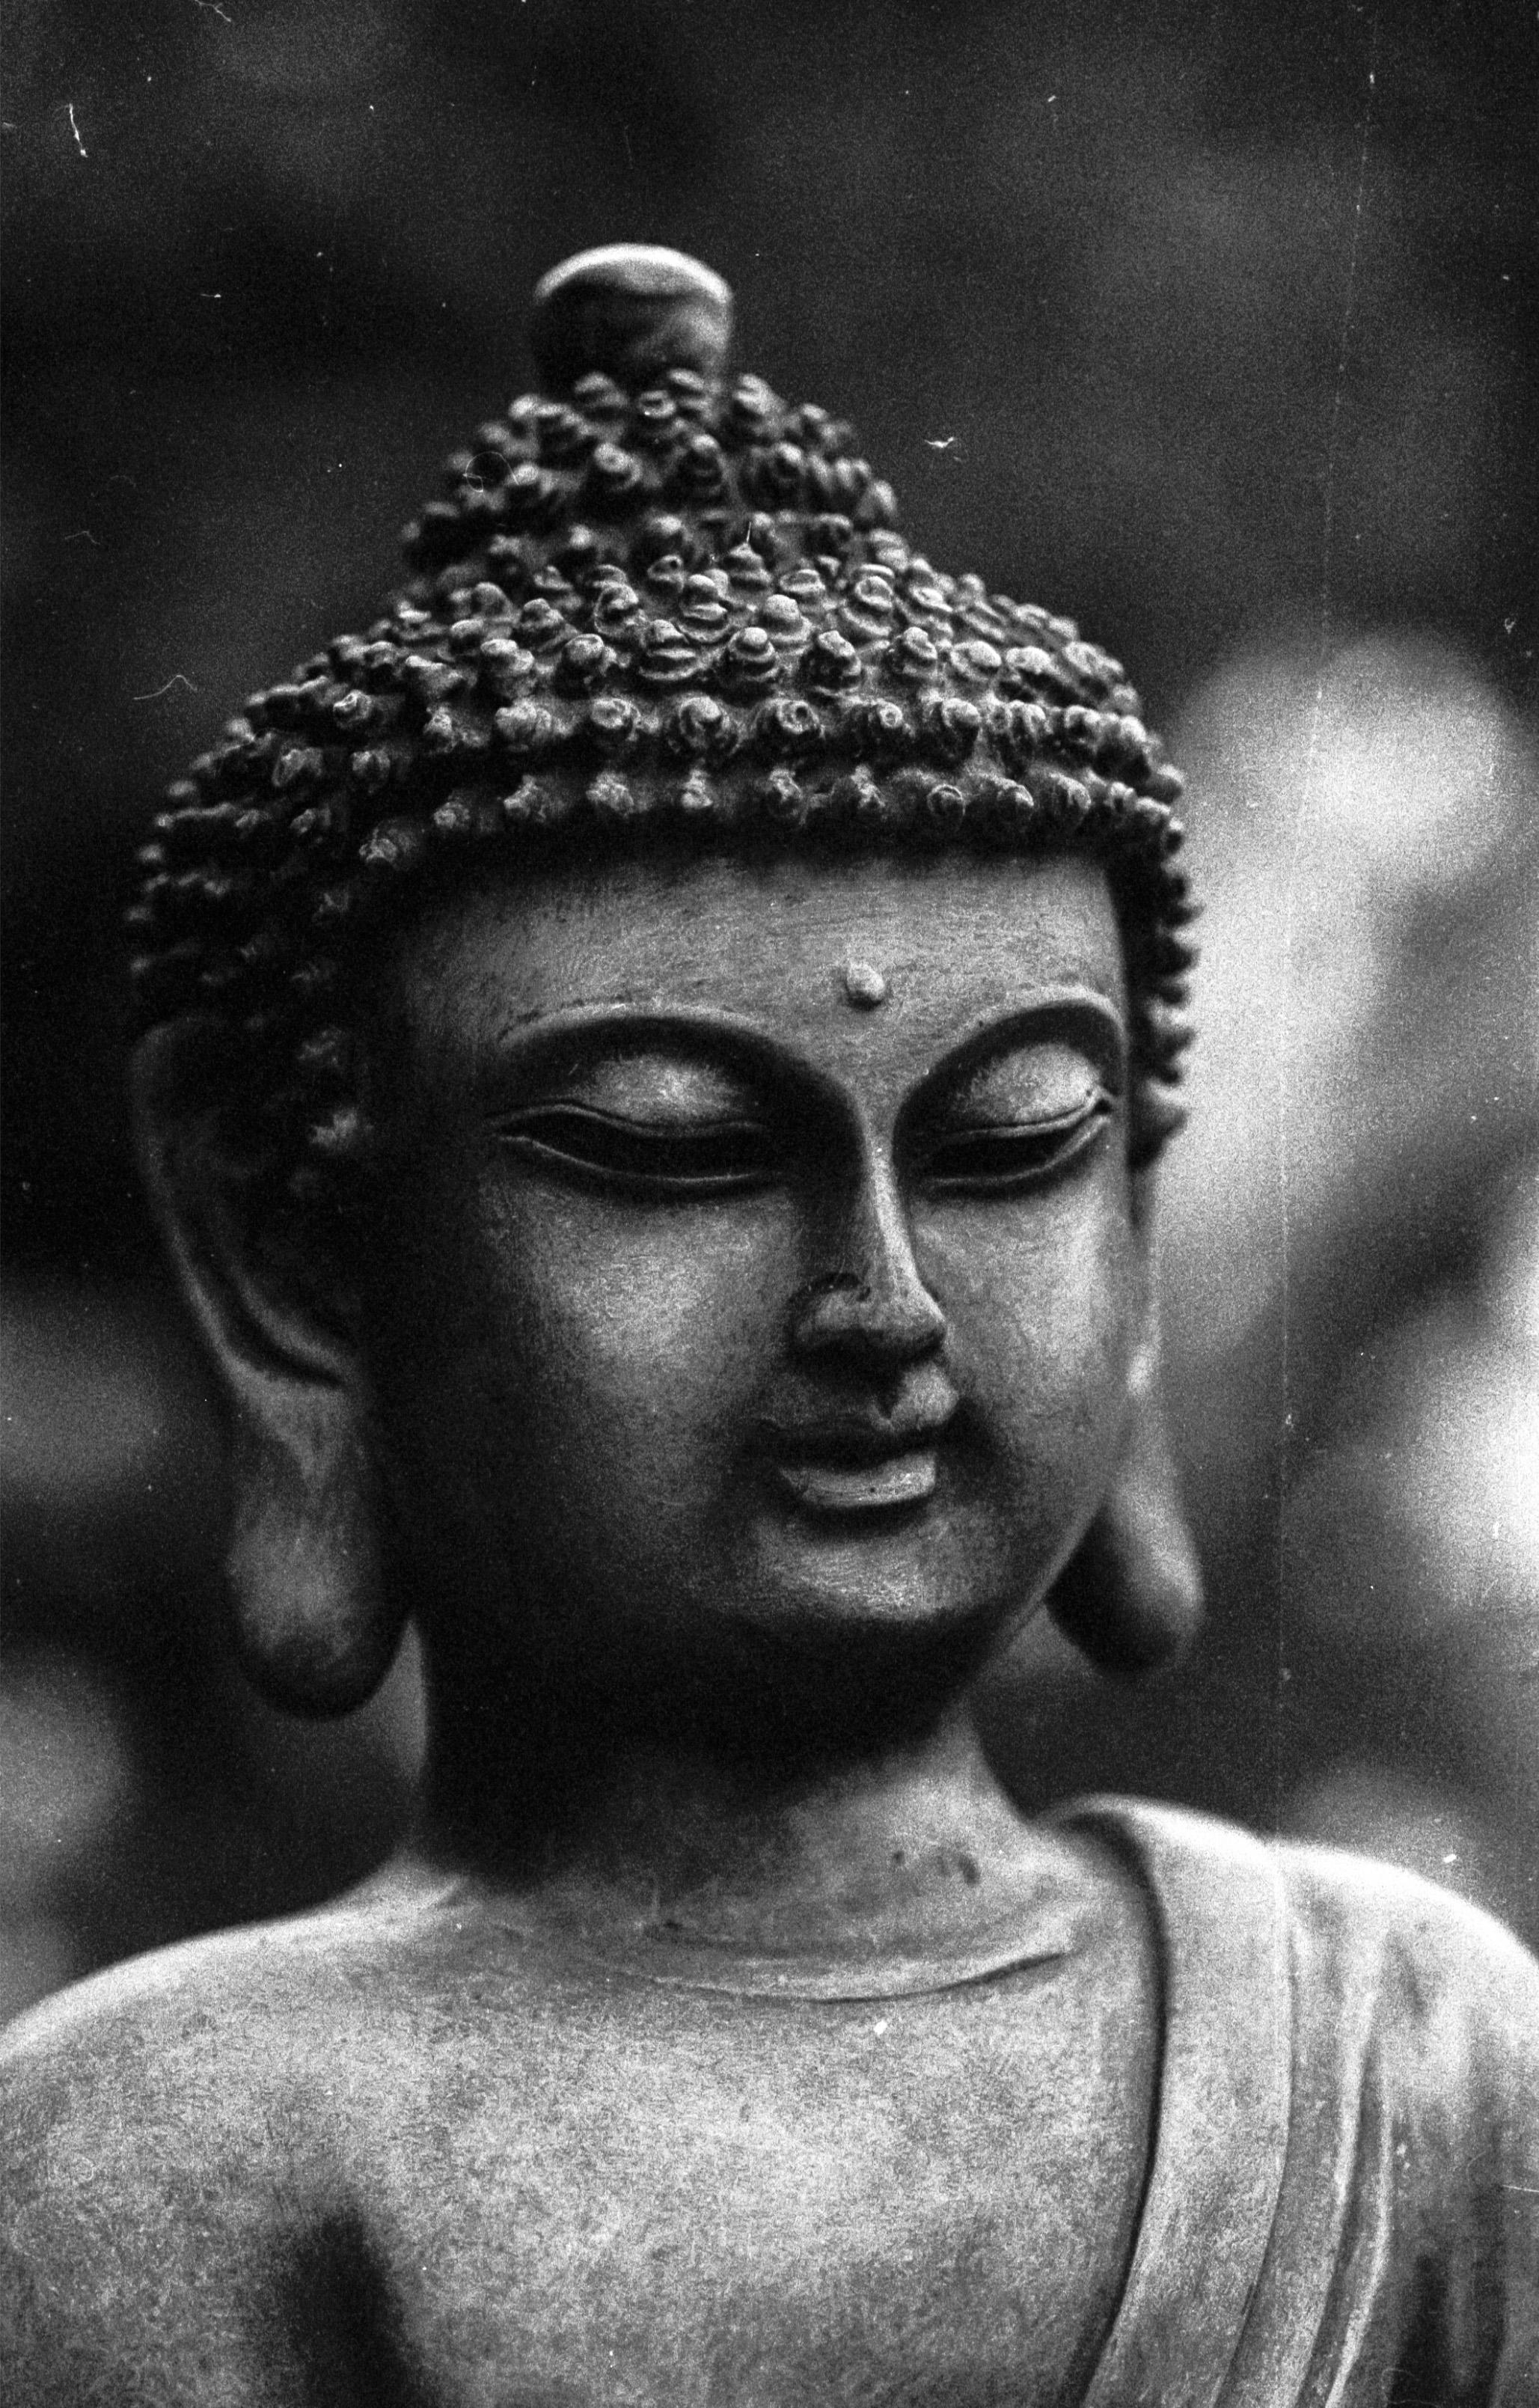 Black and white photography monument statue calm meditate black monochrome sculpture art temple head photograph beauty